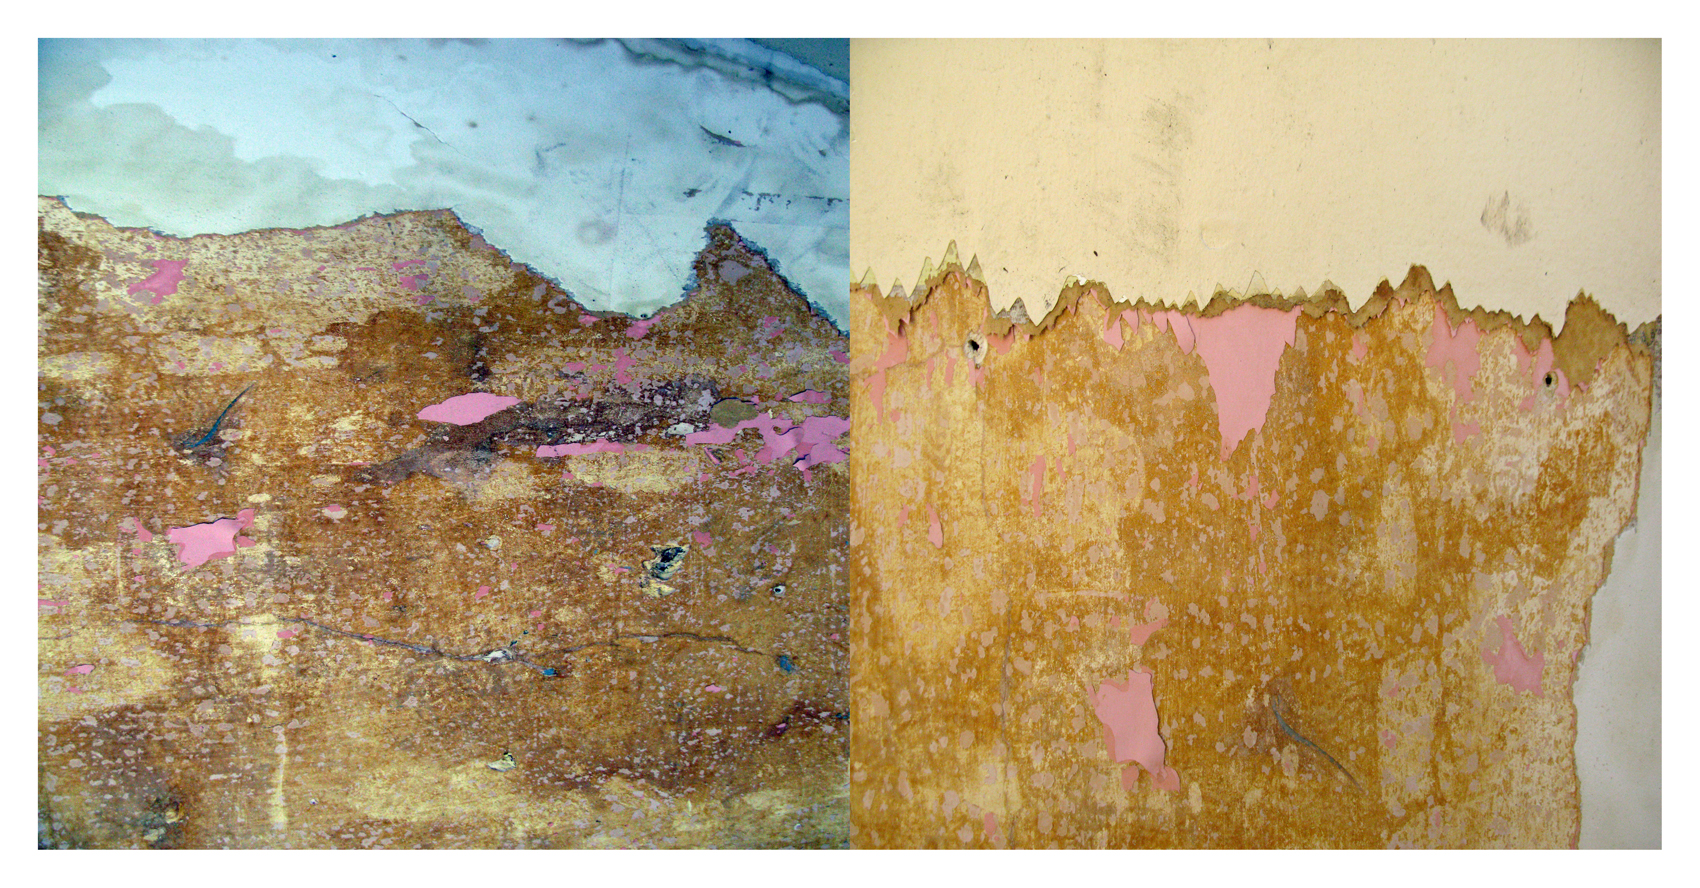 """Torn Landscape"" 2014  18"" x 36"" digital print  variablesizes available"